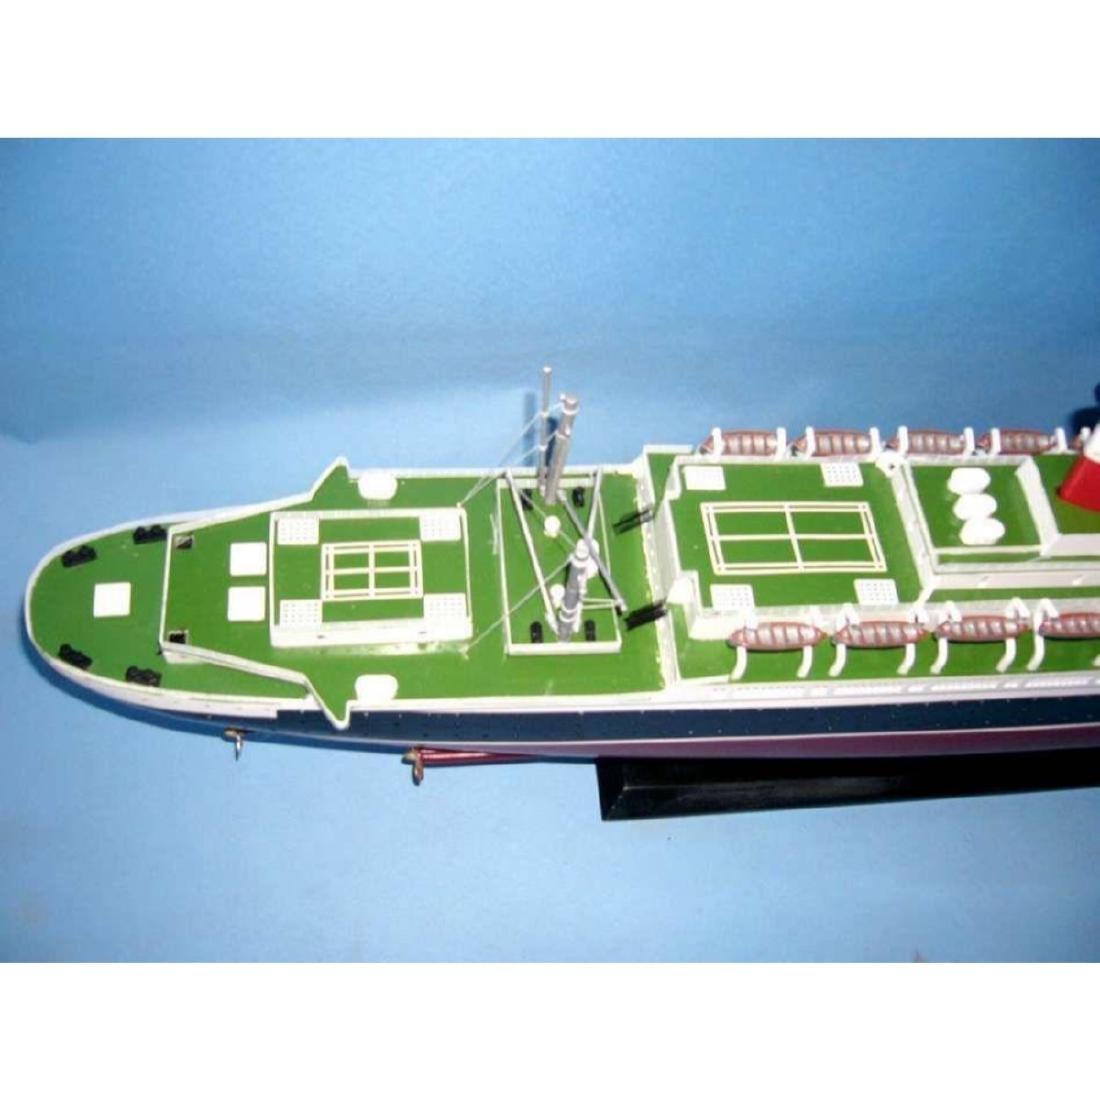 "SS United States Limited Model Cruise Ship 40"" w/ LED - 7"